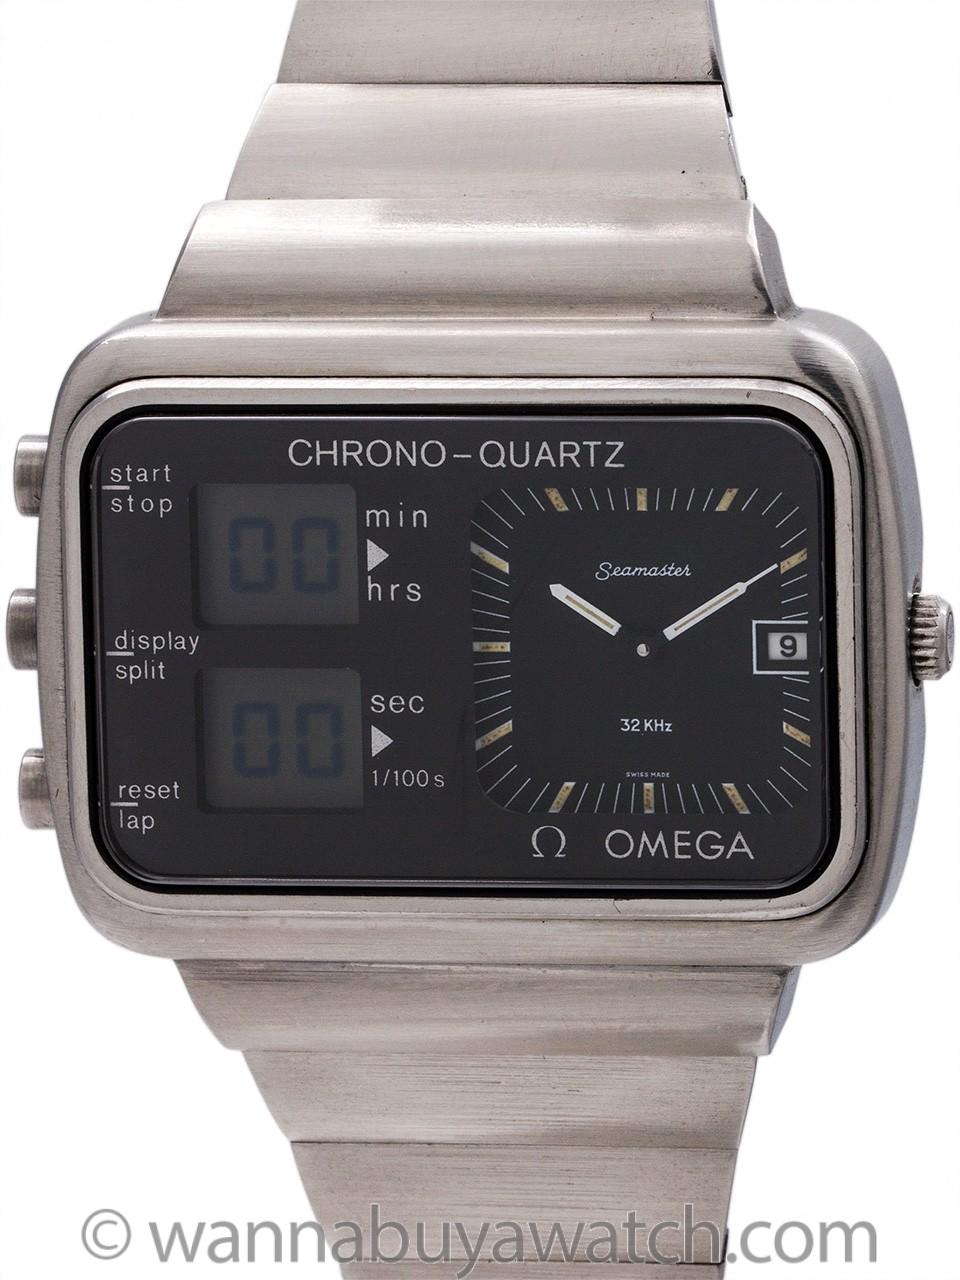 Omega Seamaster Chrono-Quartz Montreal Olympics circa 1976